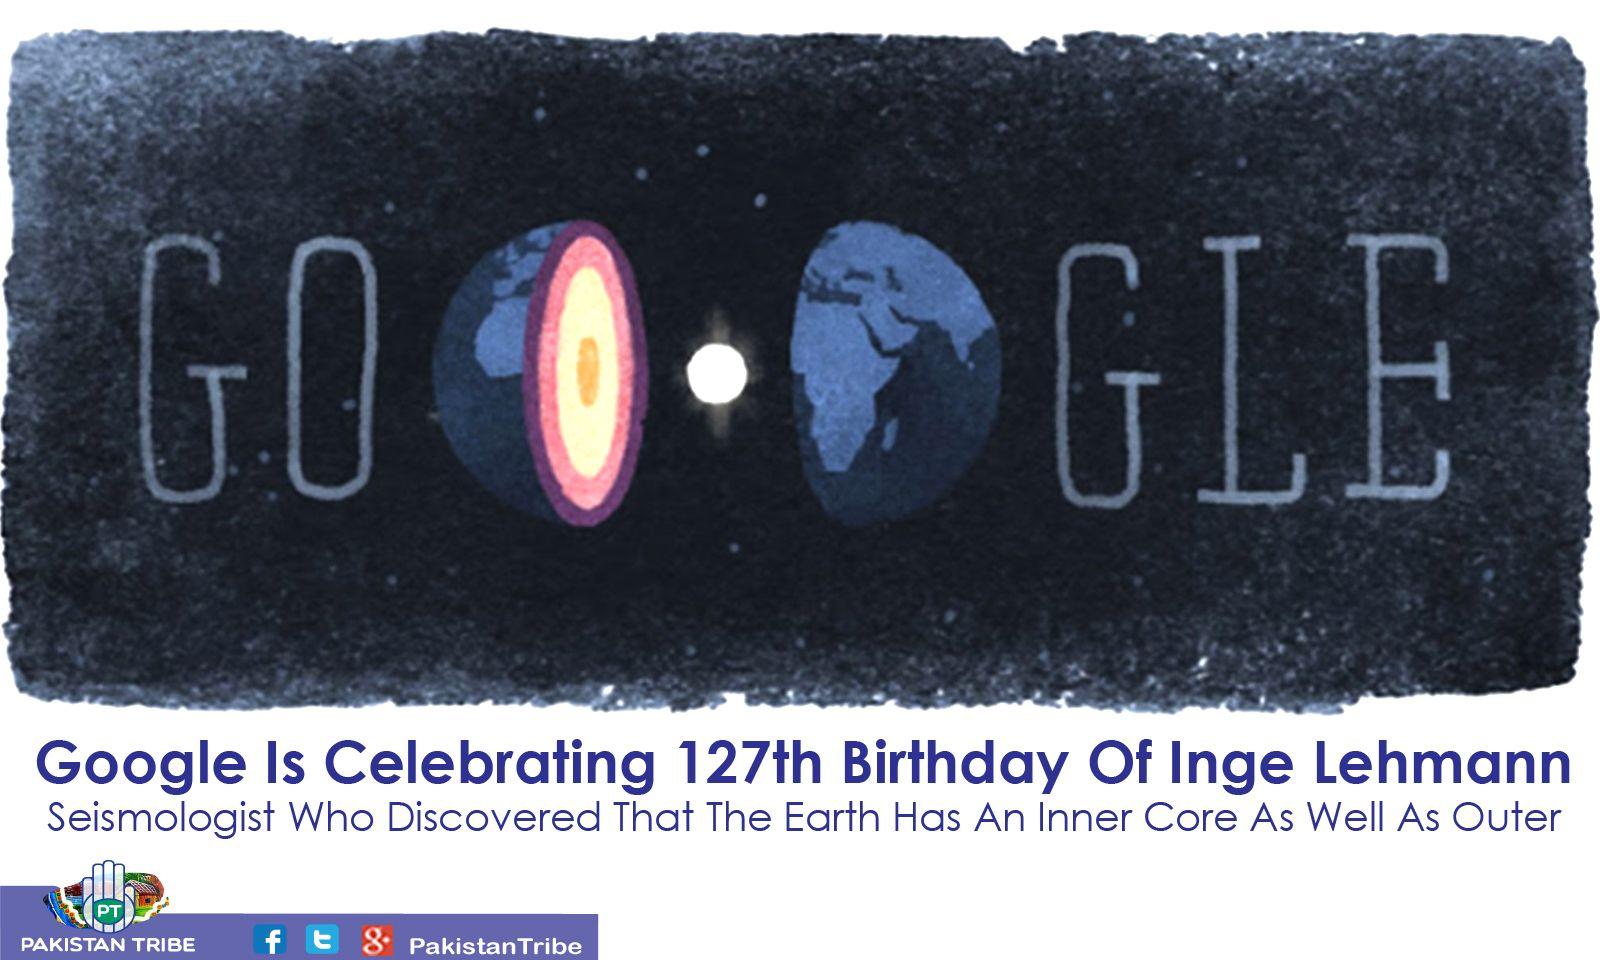 Google Is Celebrating 127th Birthday Of Inge Lehmann